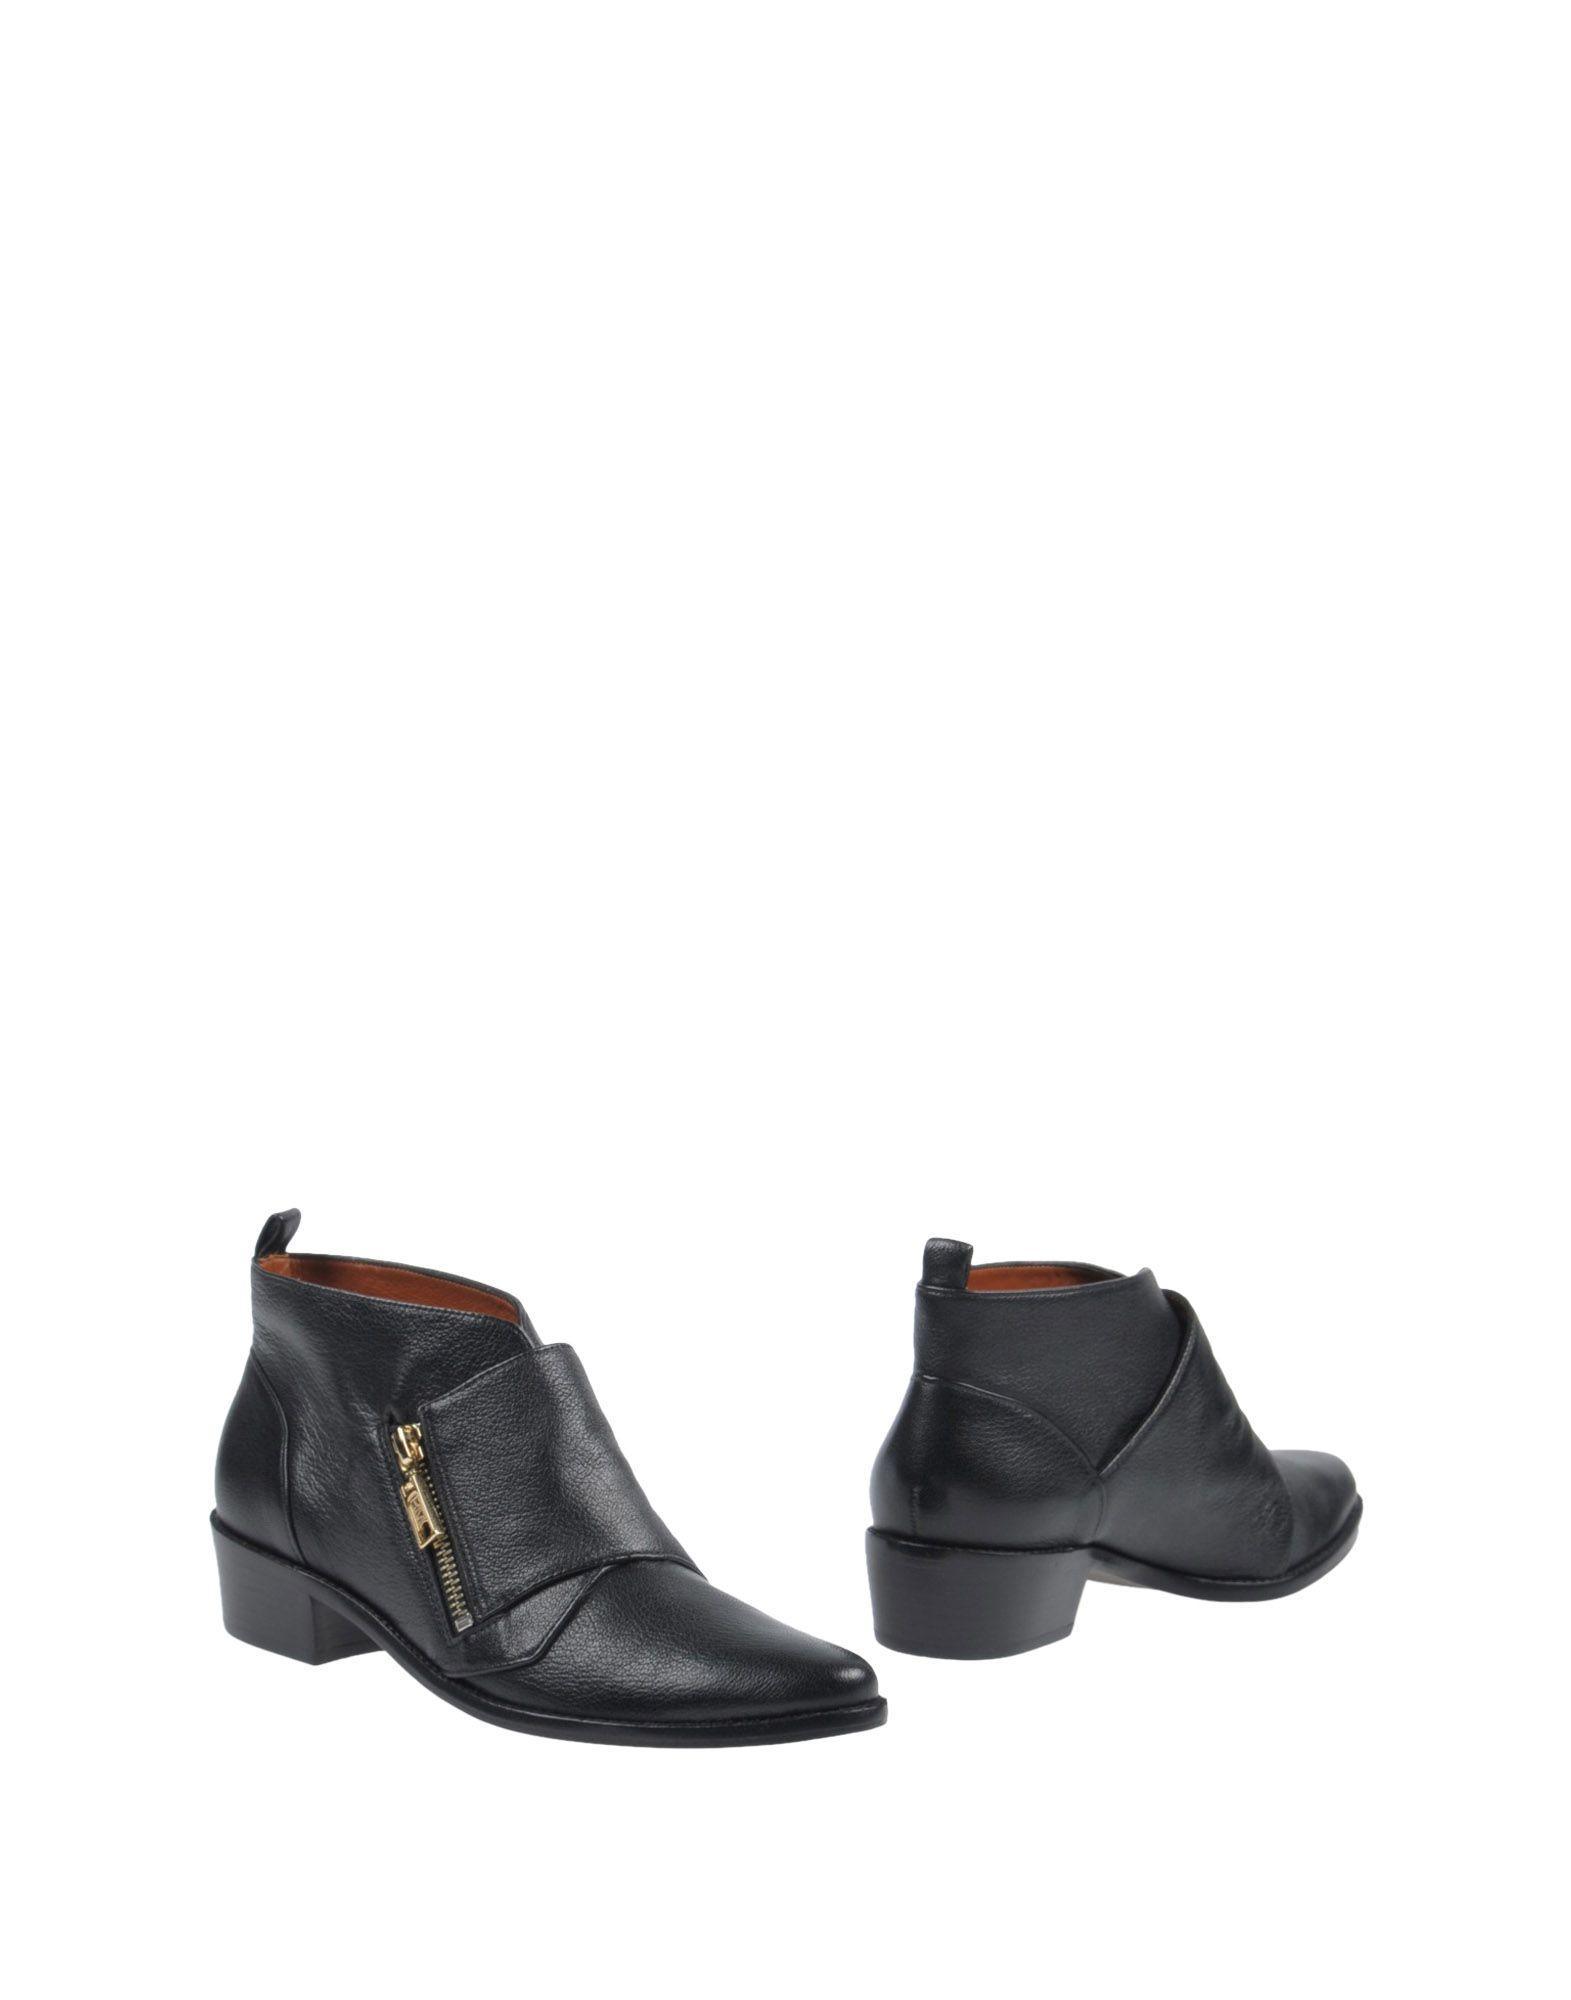 Rebecca Minkoff Ankle Boot In Black